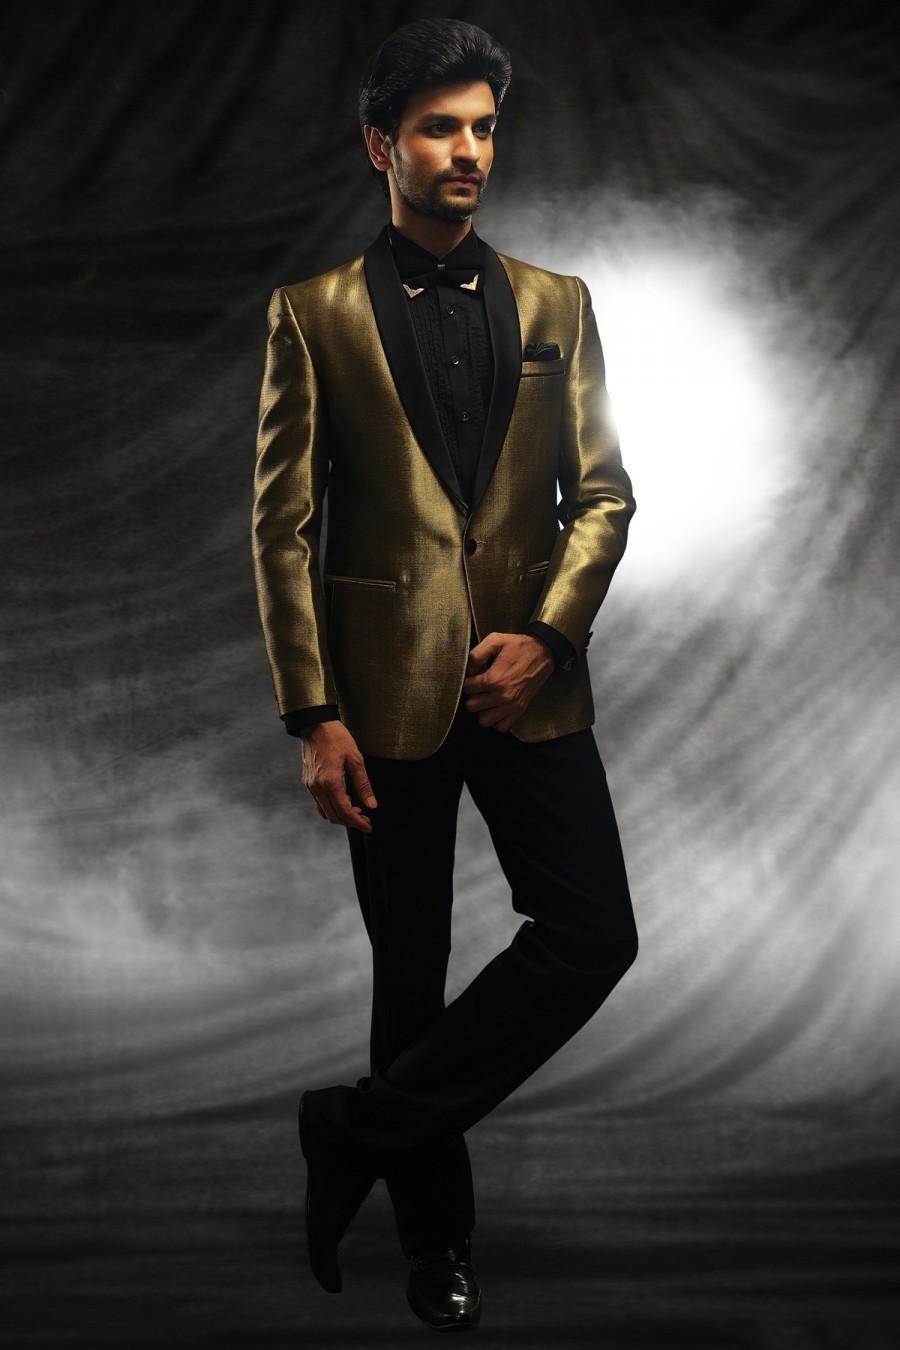 Wedding - Gold satin velvet classy price suit with shawl lapel